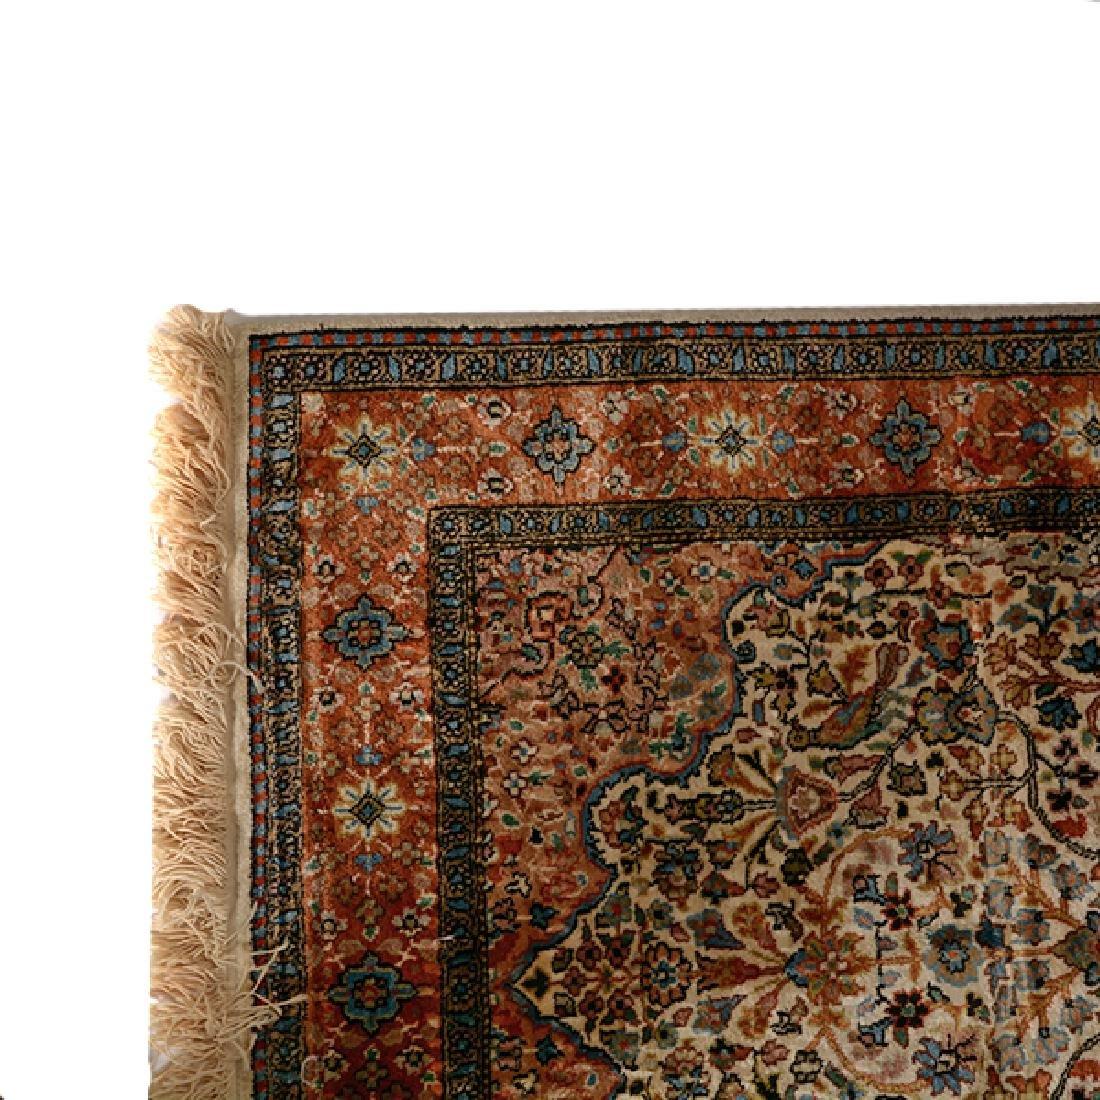 Egyptian Silk Prayer Rug: 2 feet 6 inches x 4 feet 3 - 2